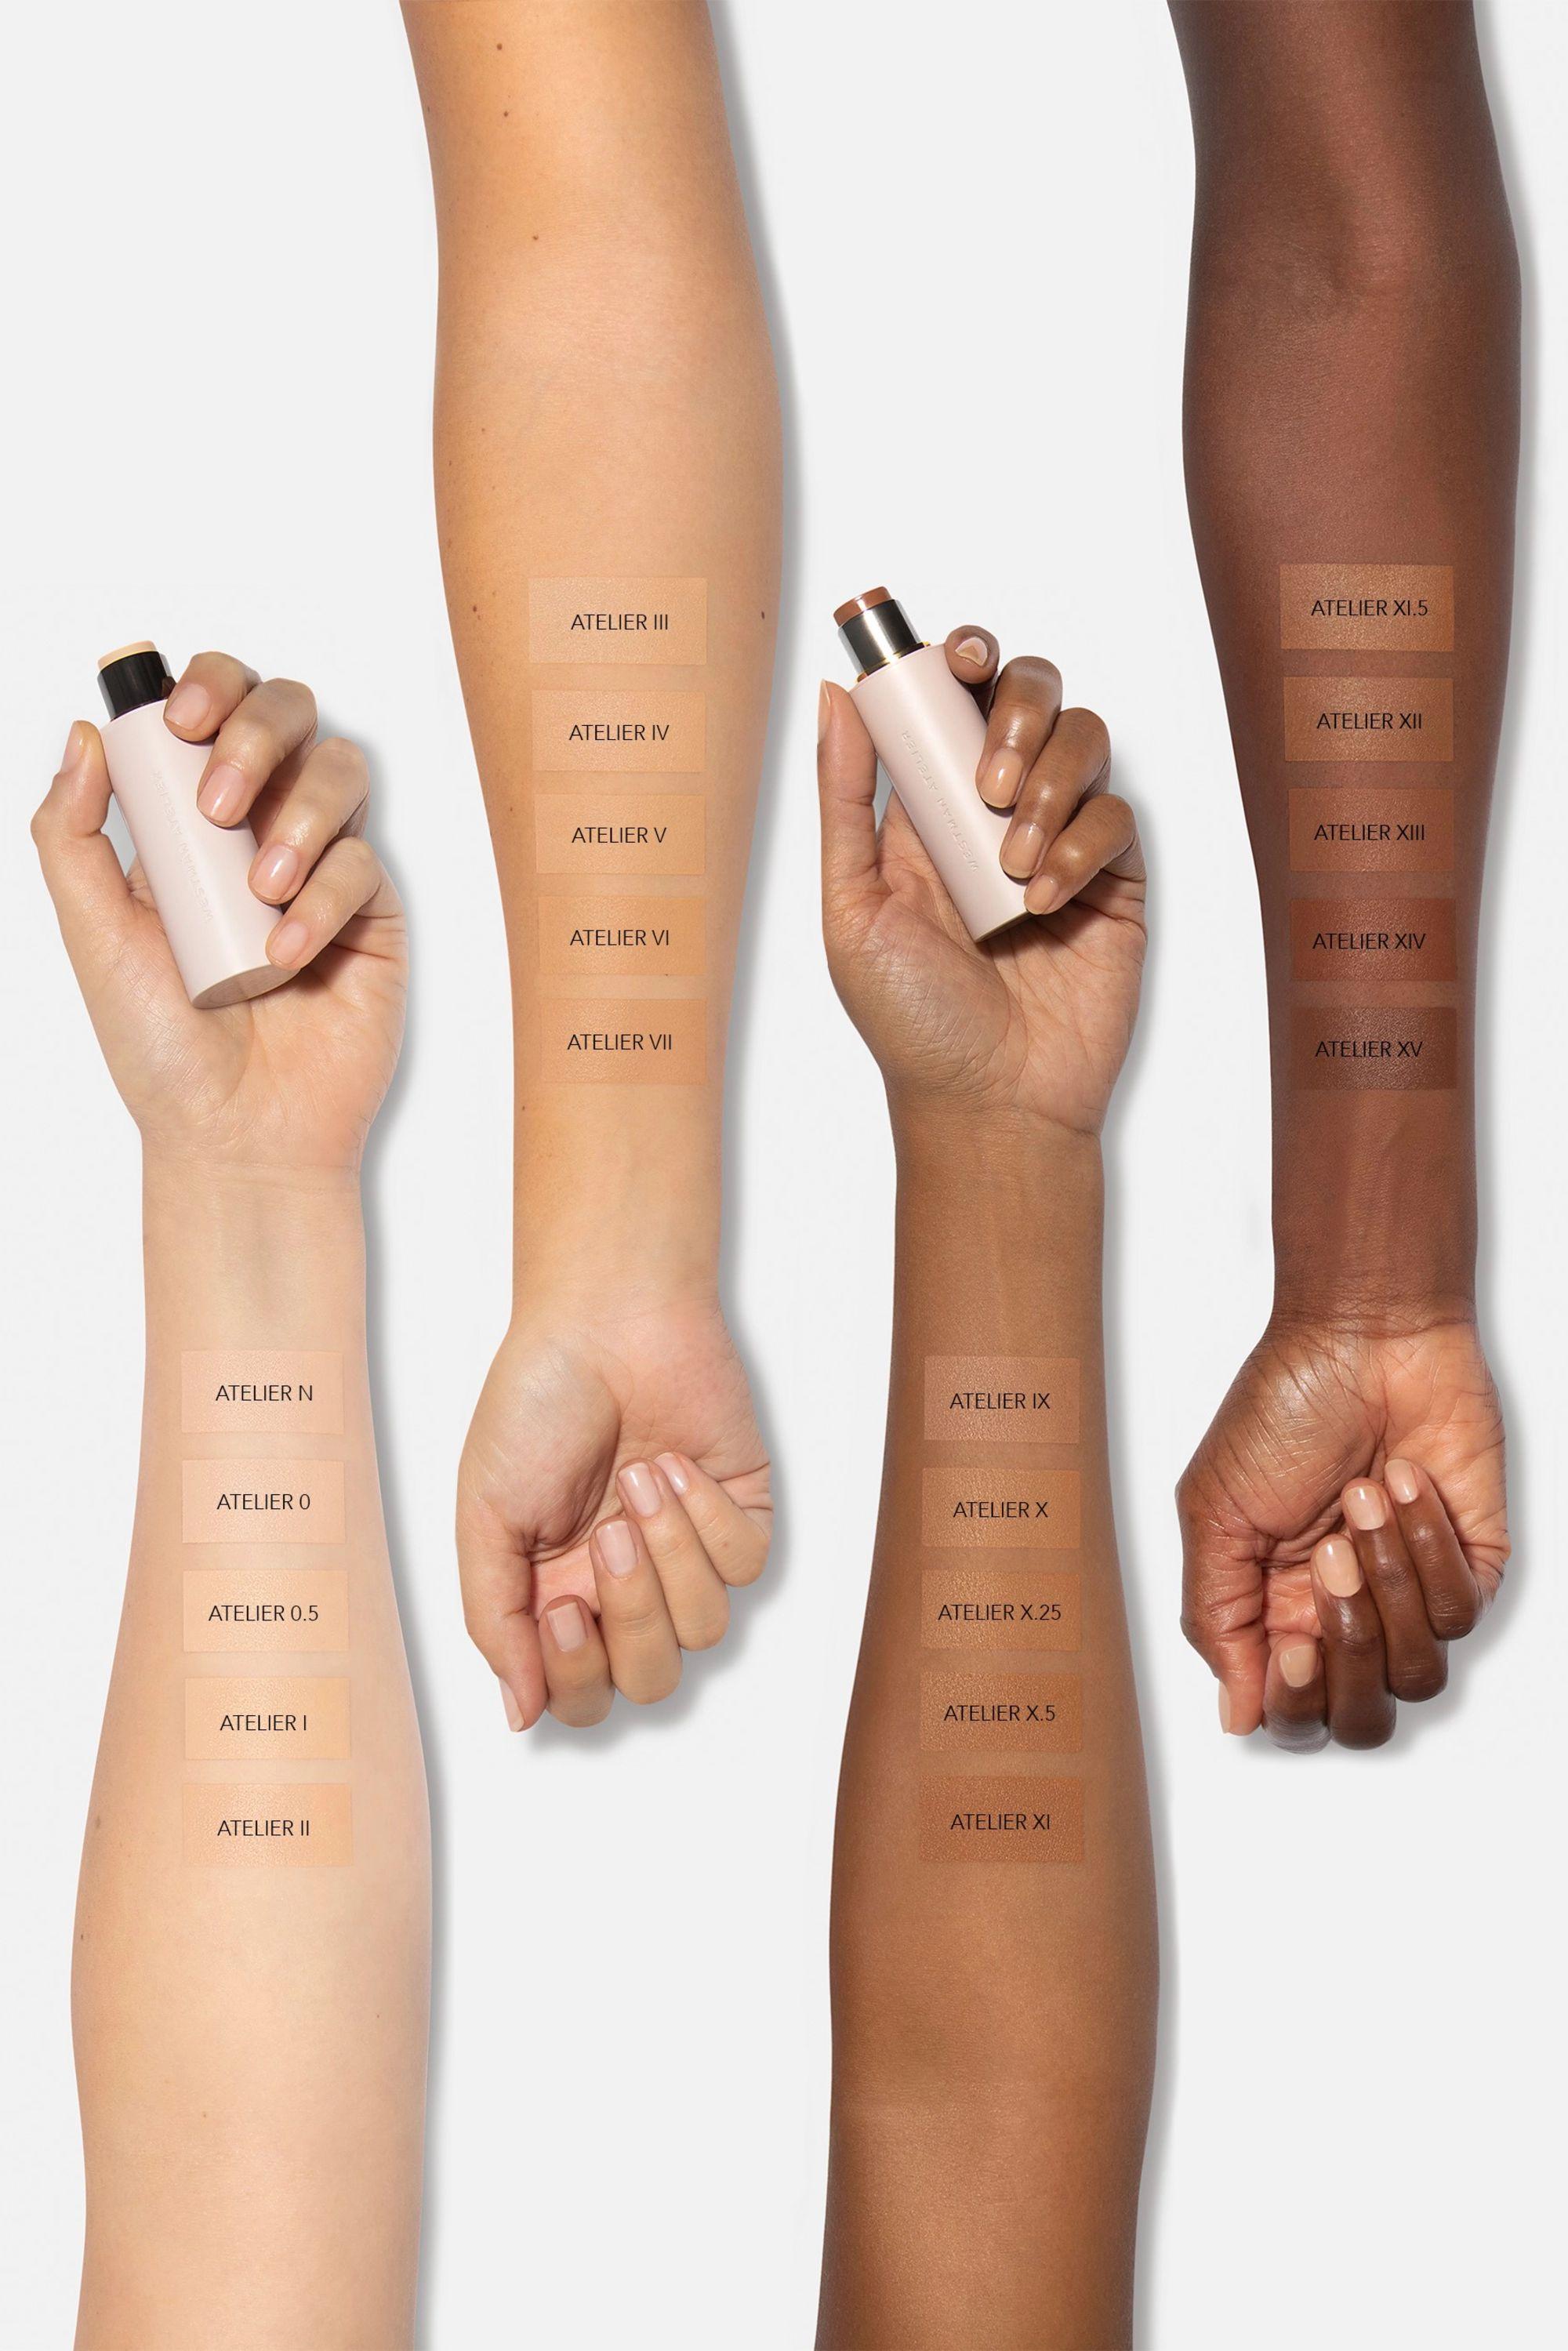 Westman Atelier Vital Skin Foundation Stick - Atelier 0